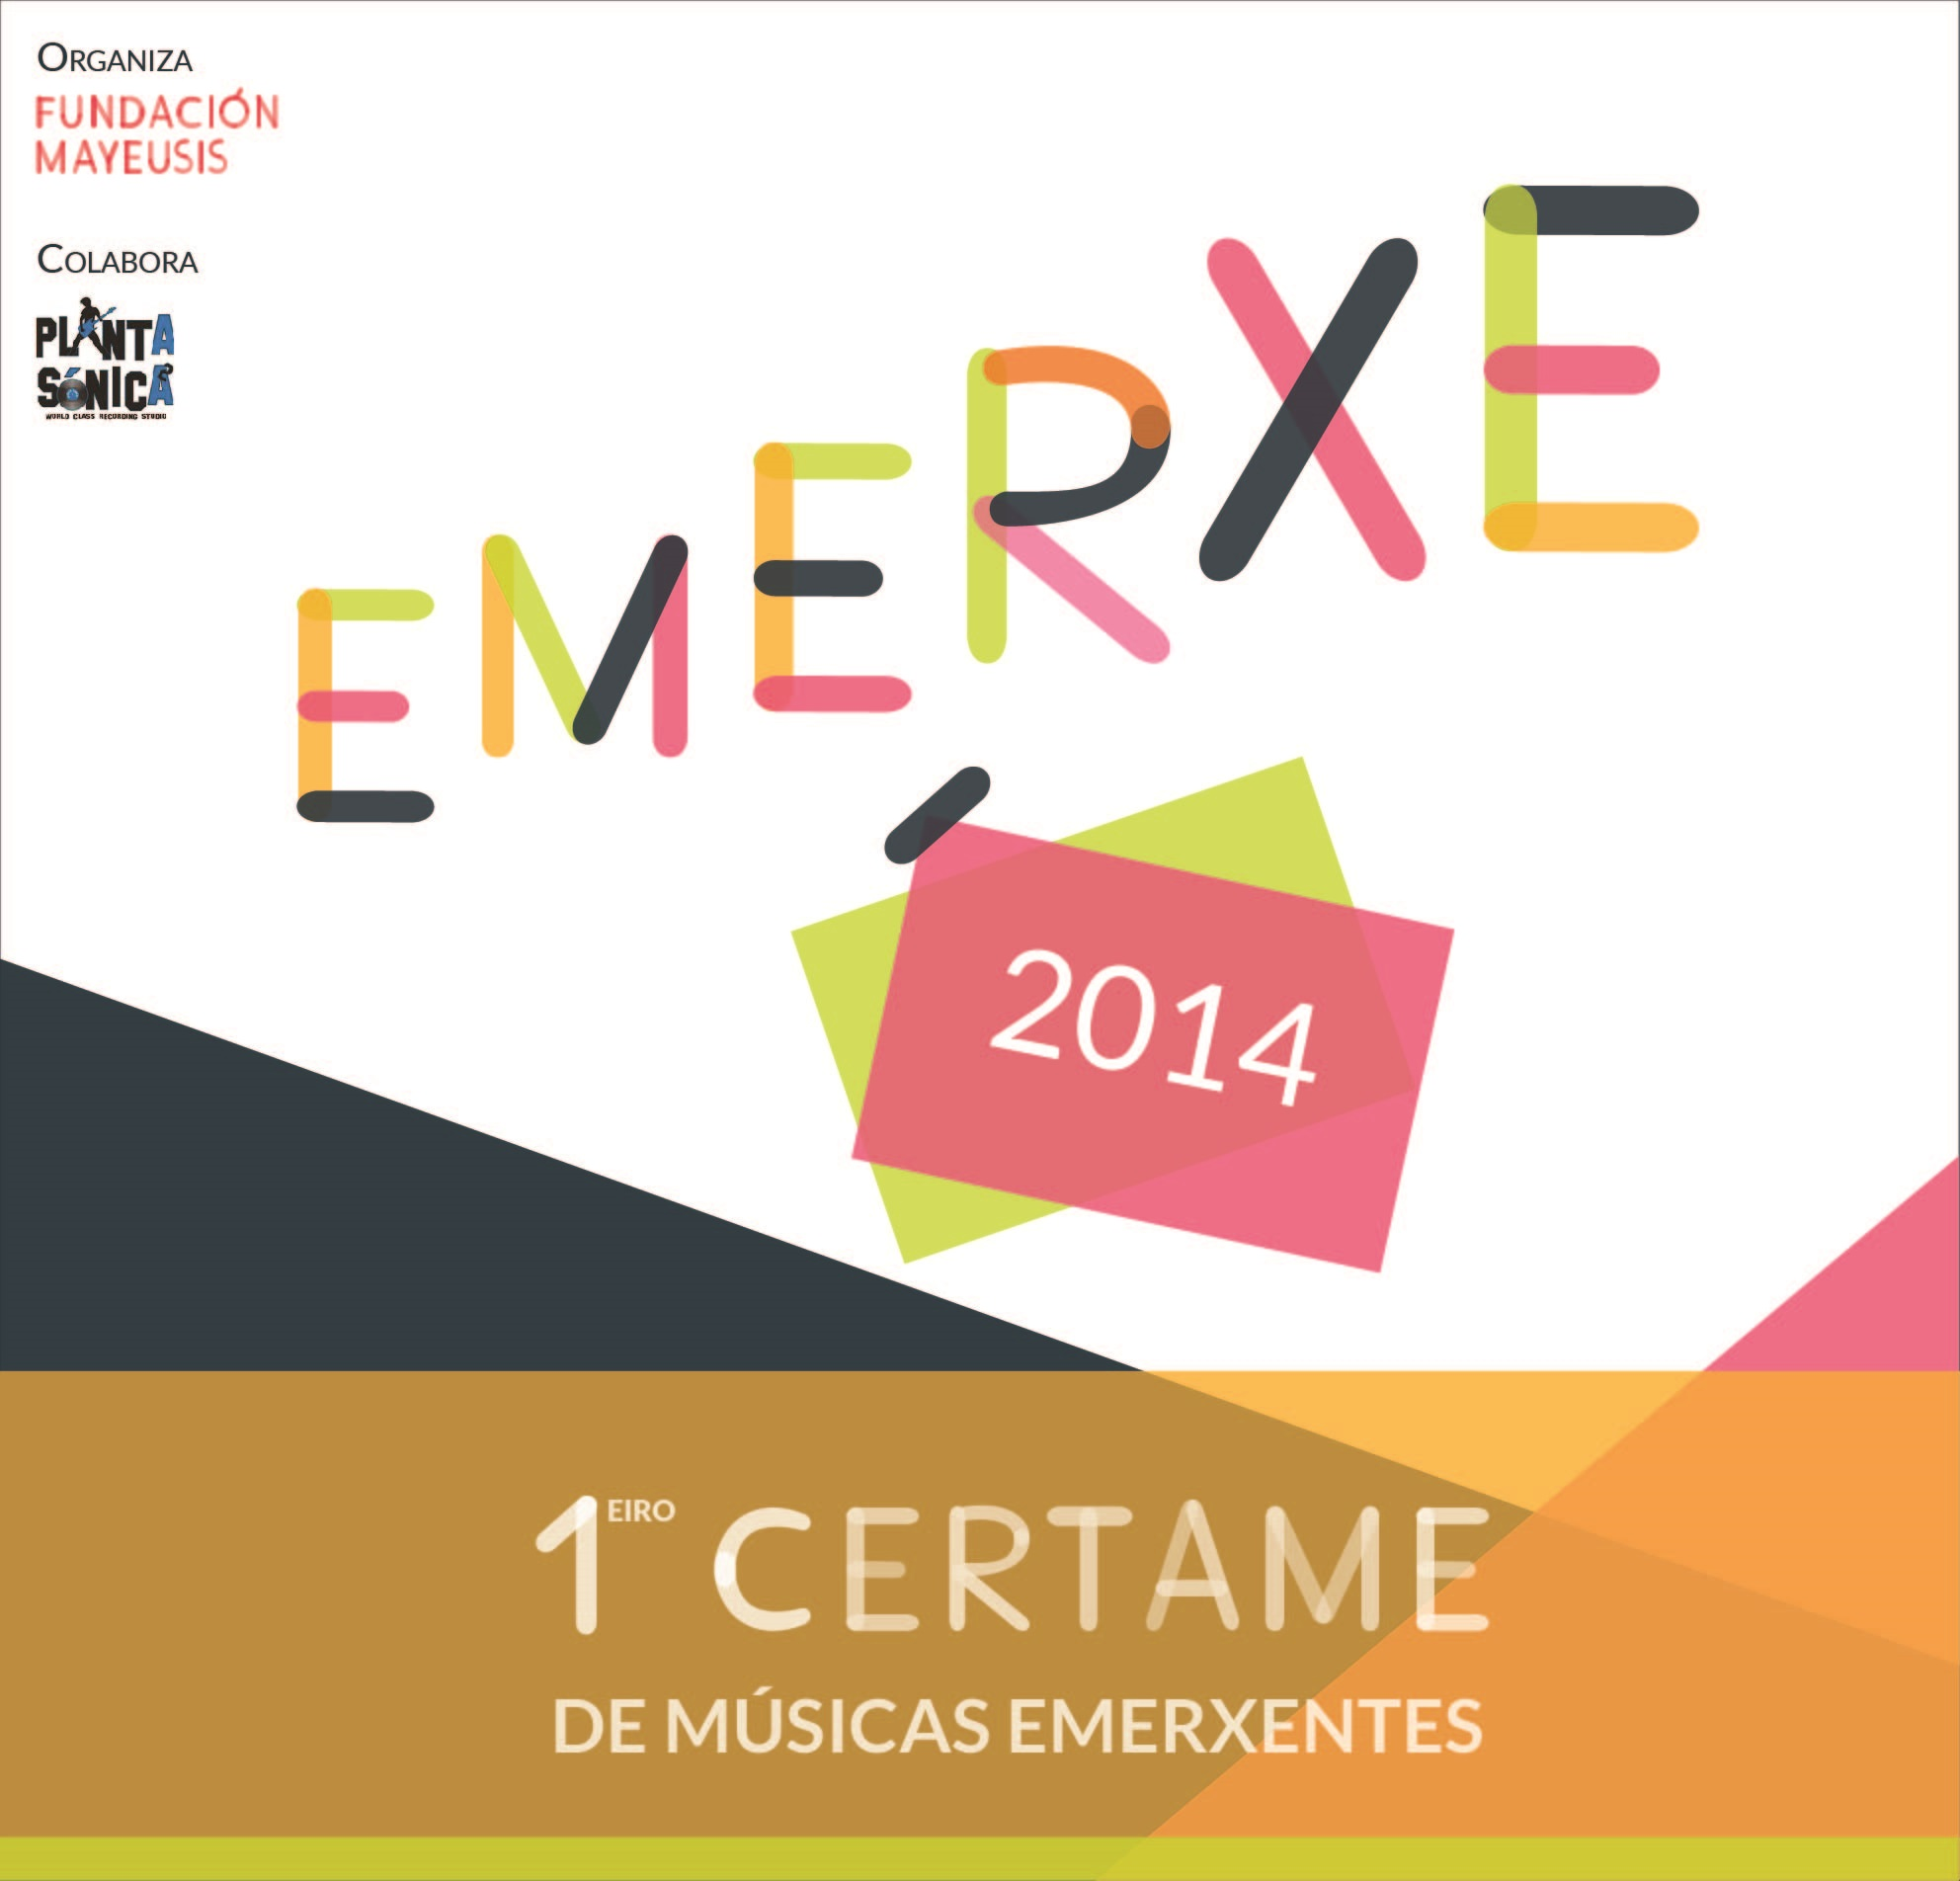 CARTEL EMERXE 2014